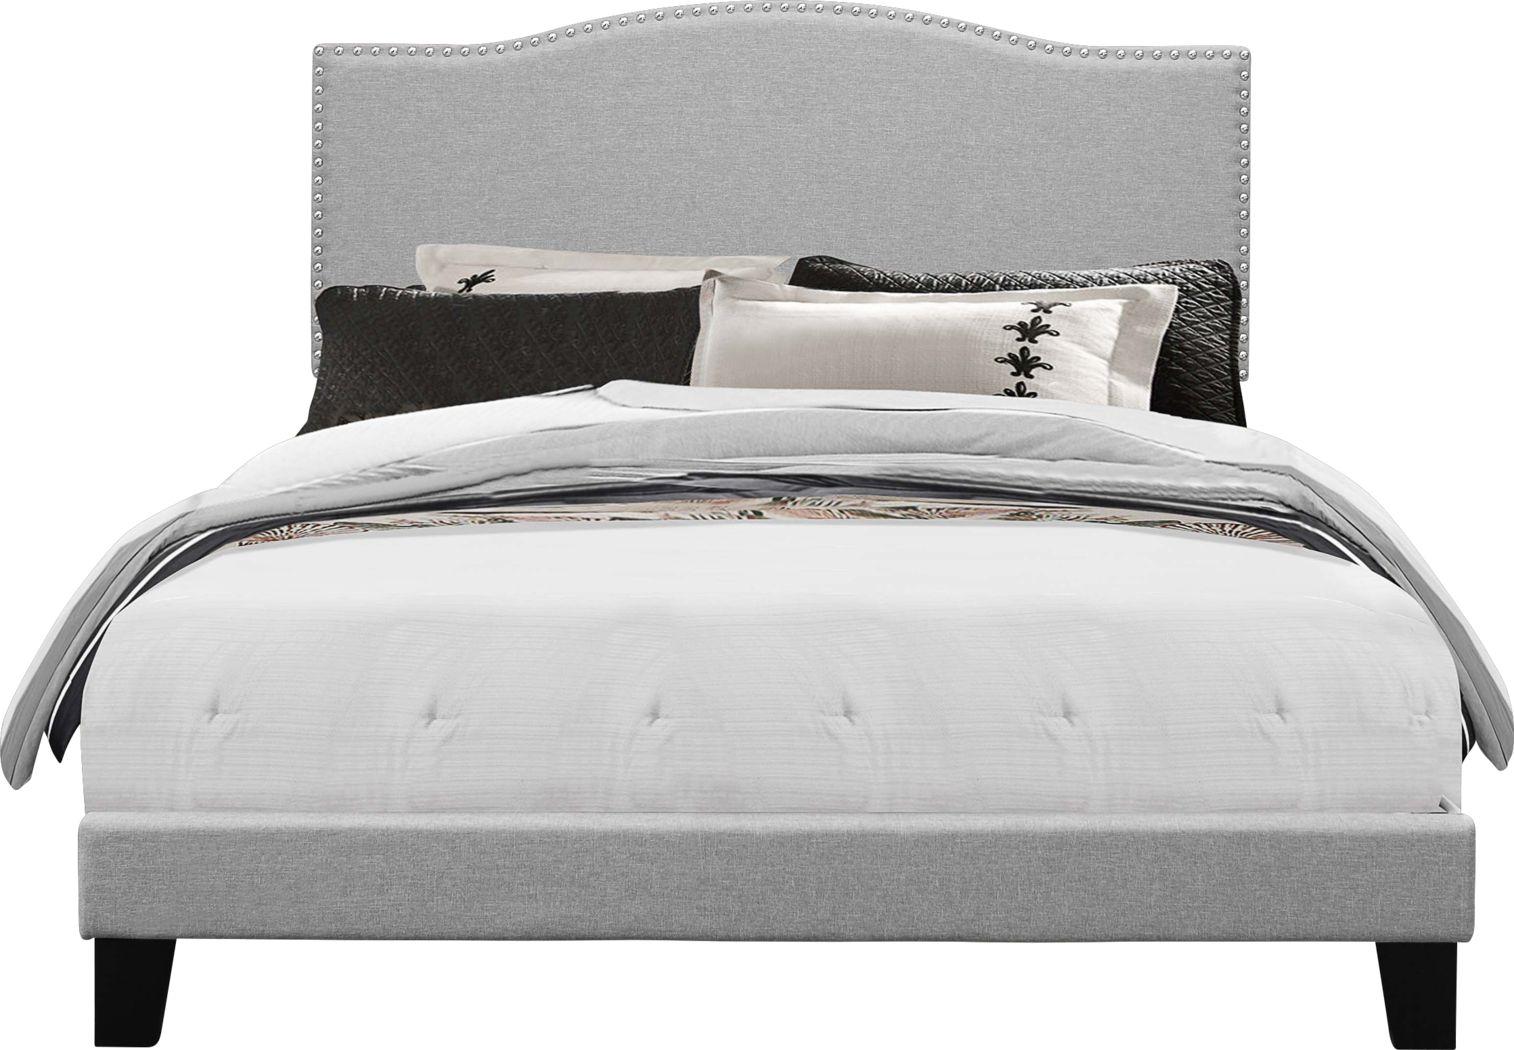 Kiley Gray Queen Upholstered Bed